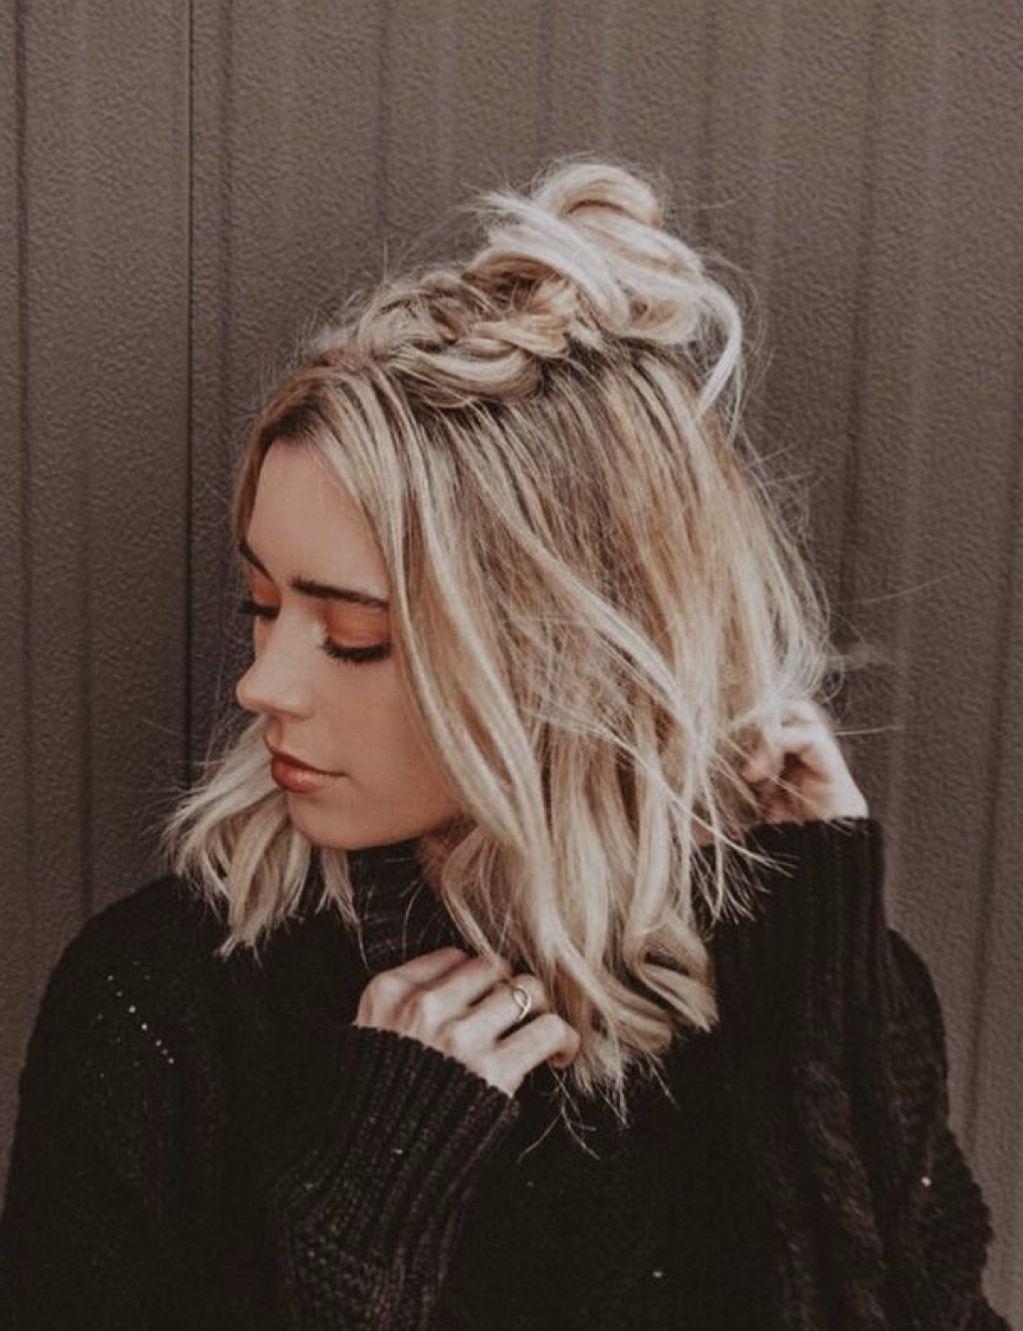 Hair Inspiration 2019-04-02 21:32:38